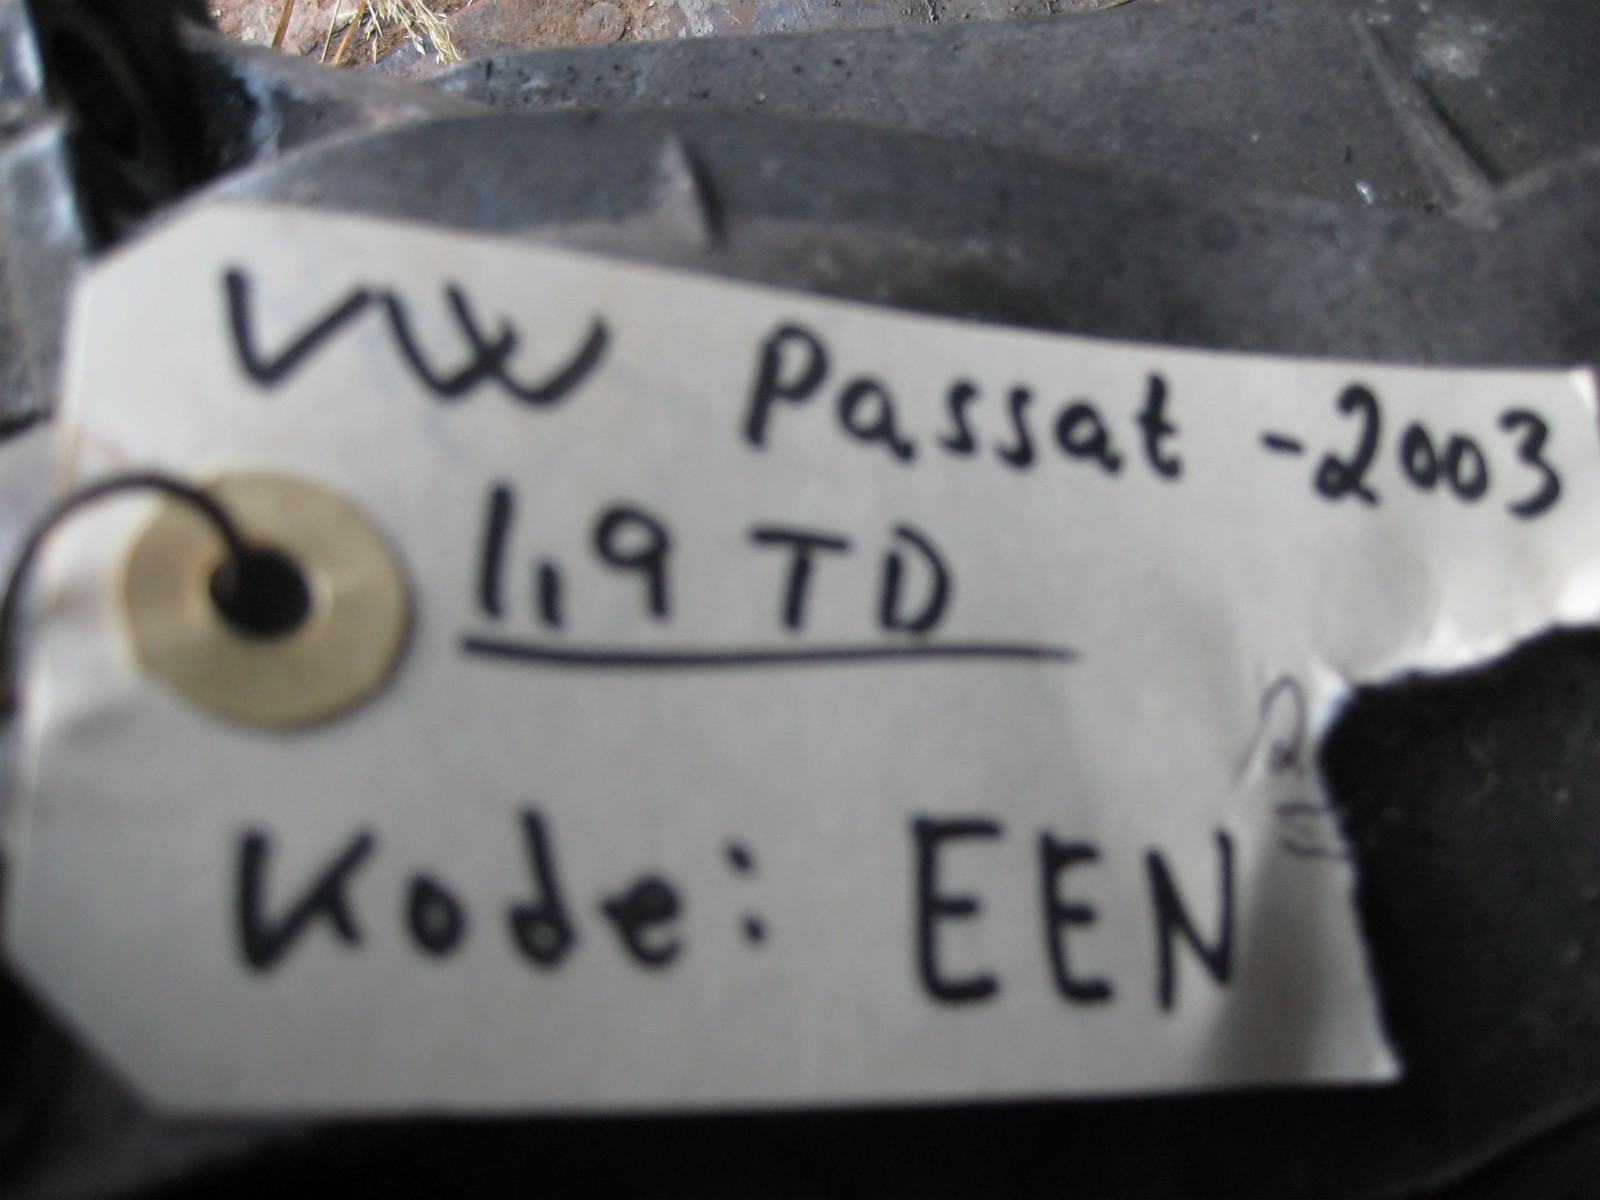 Girkasse Passat 1.9 TDI  2003 model , girkasse kode EEN selges kr 2000. - øyer  - Girkasse Passat 1,9 TDI ,girkasse kode EEN selges kr1000. - øyer